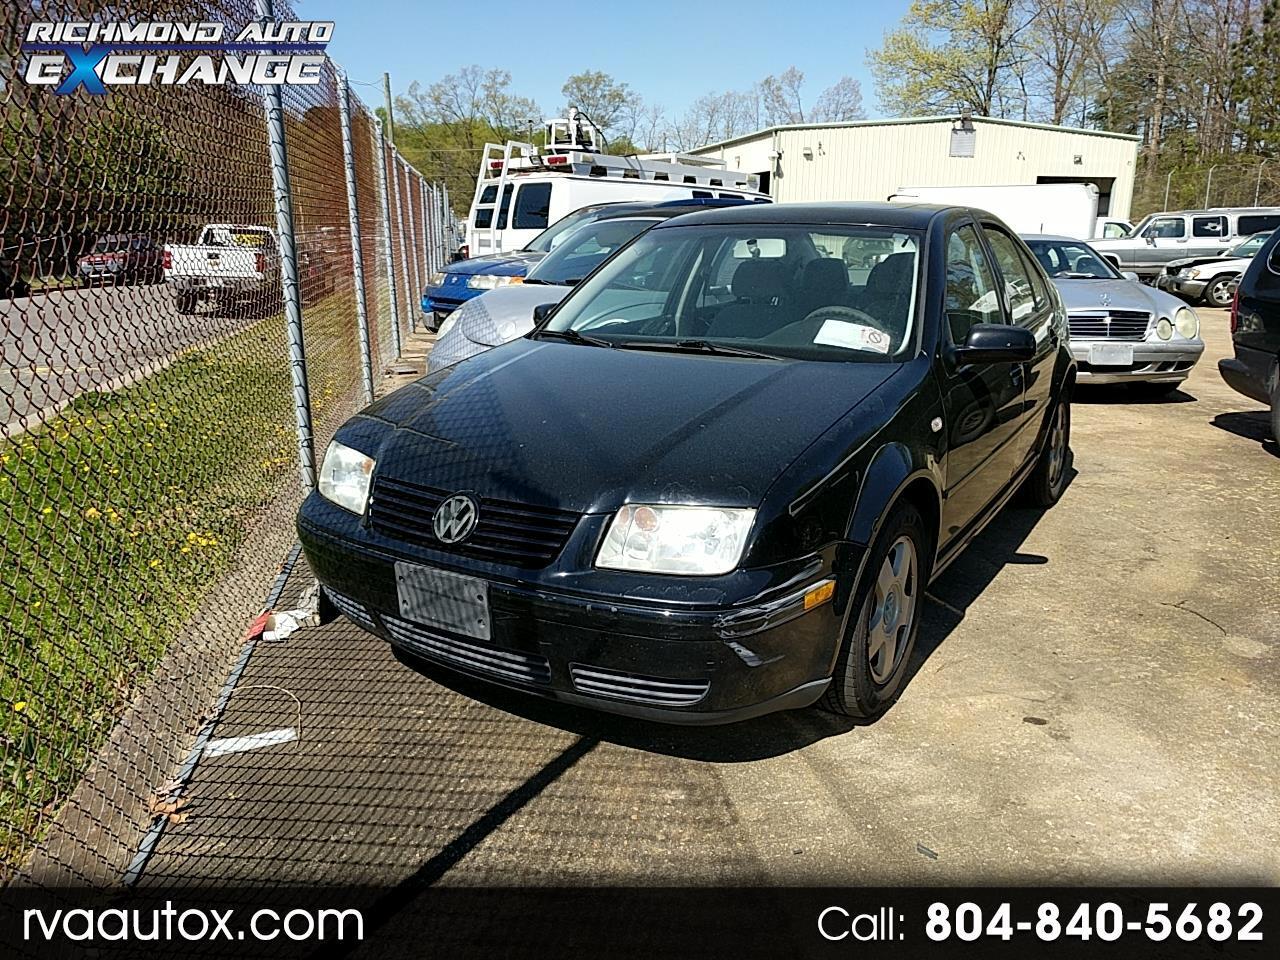 2002 Volkswagen Jetta GLS 2.0